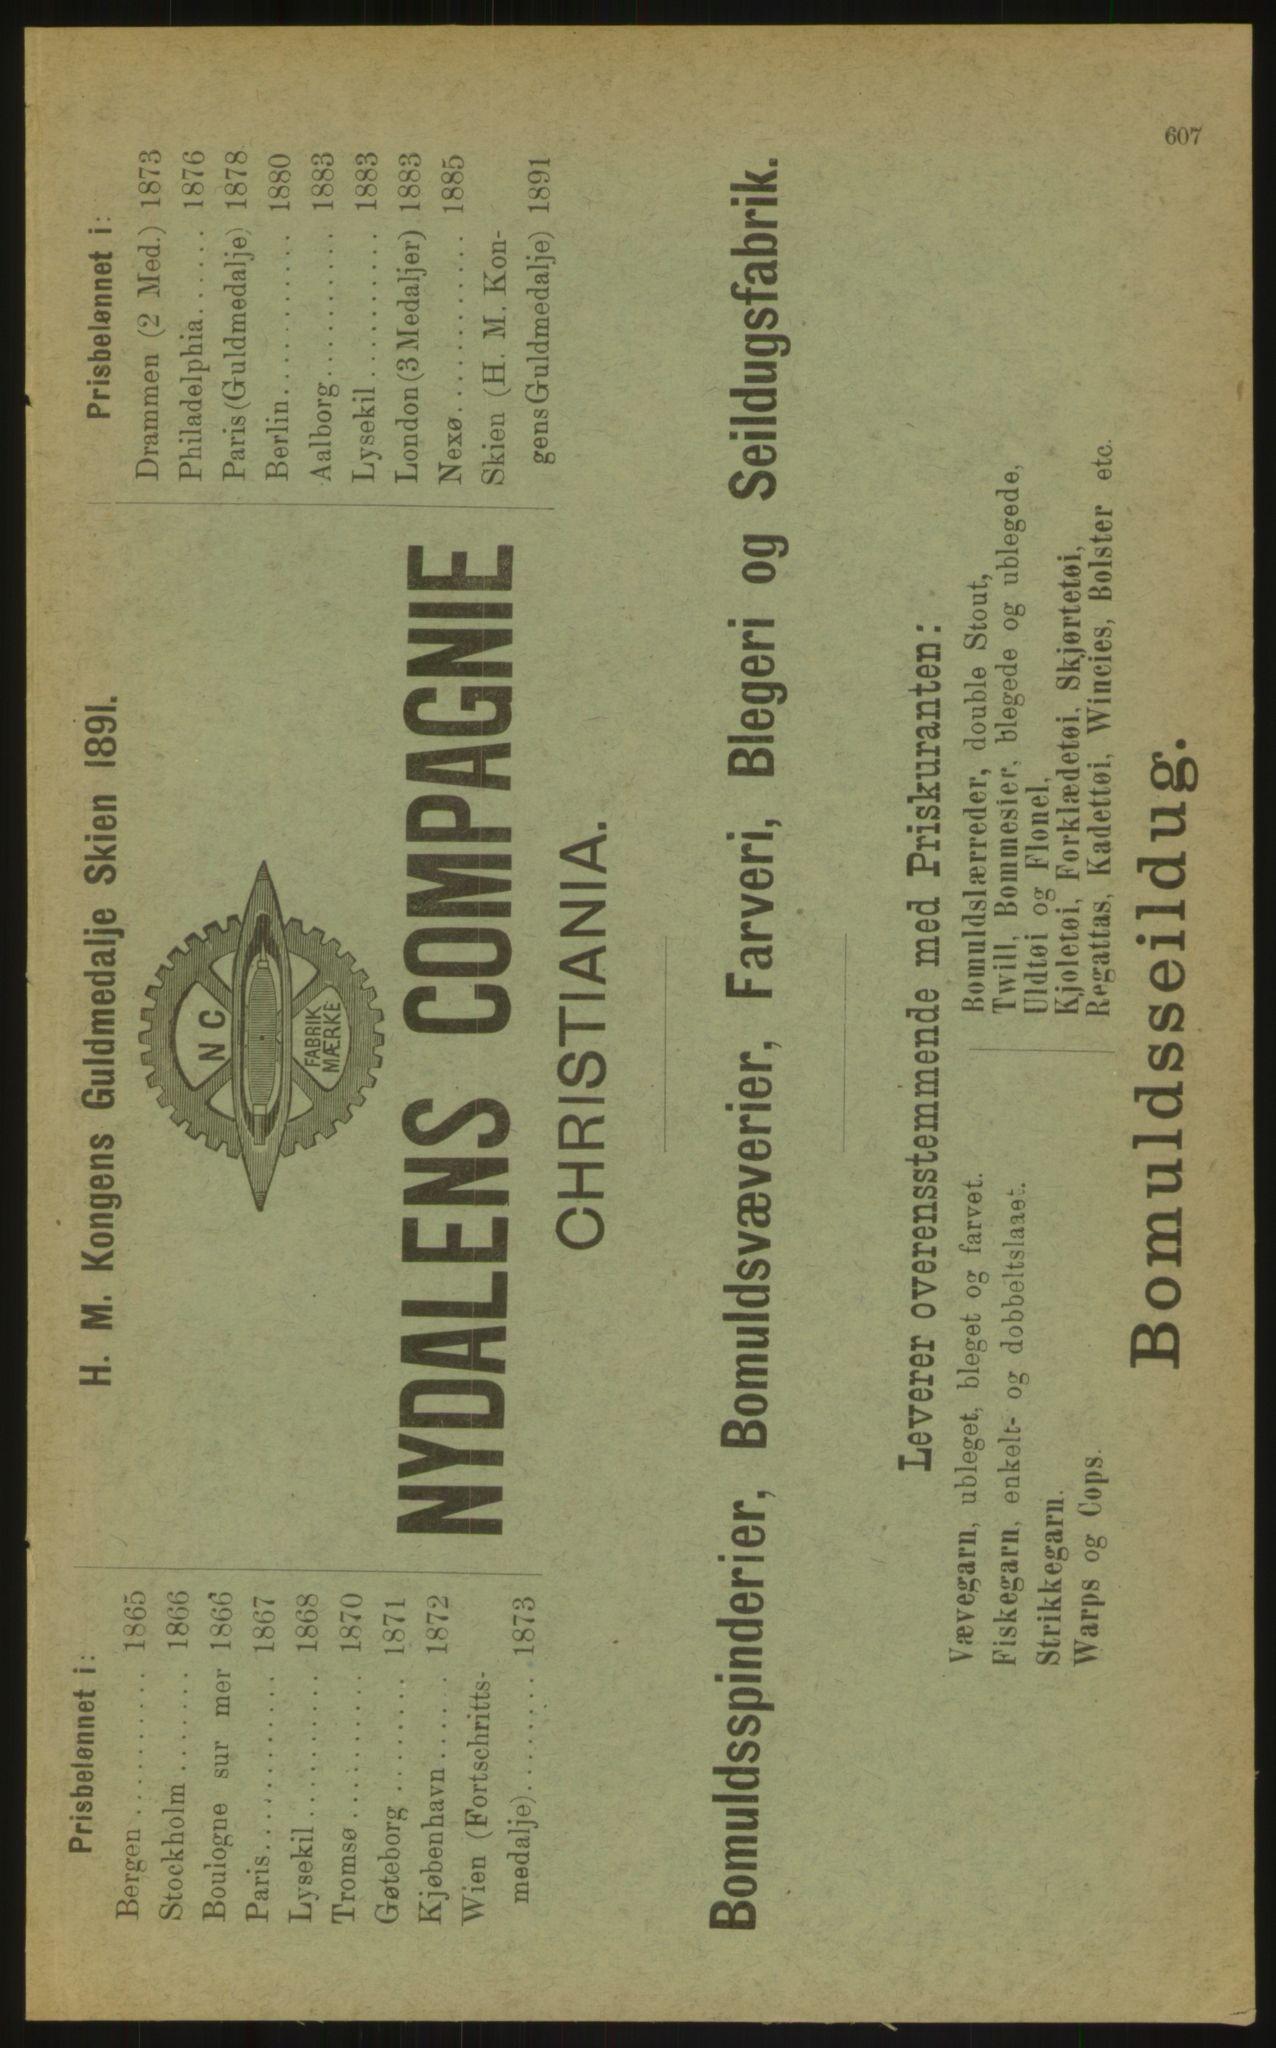 PUBL, Kristiania/Oslo adressebok, 1897, s. 607